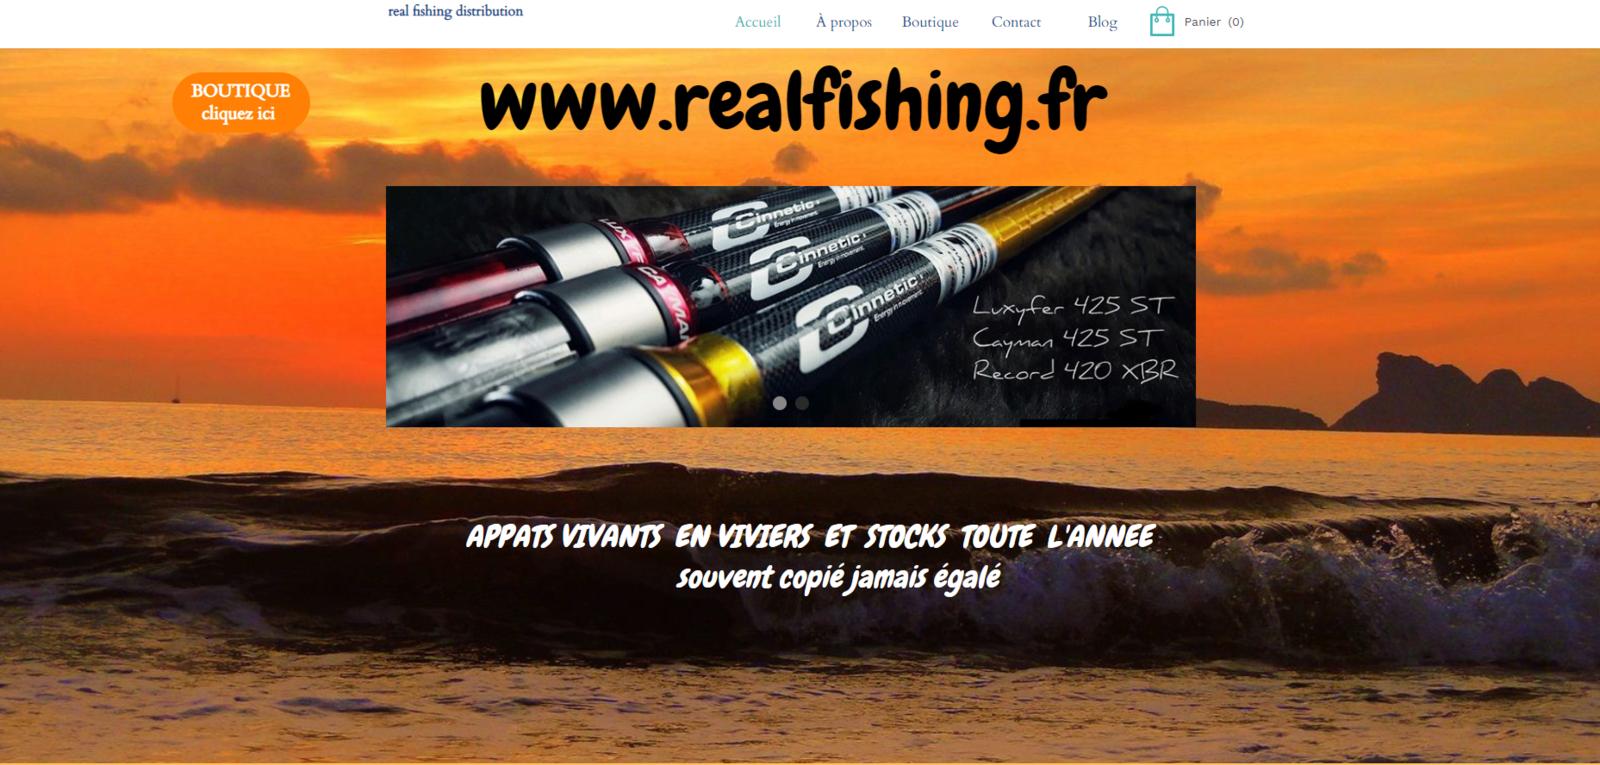 notre deuxième site  www.realfishing.fr